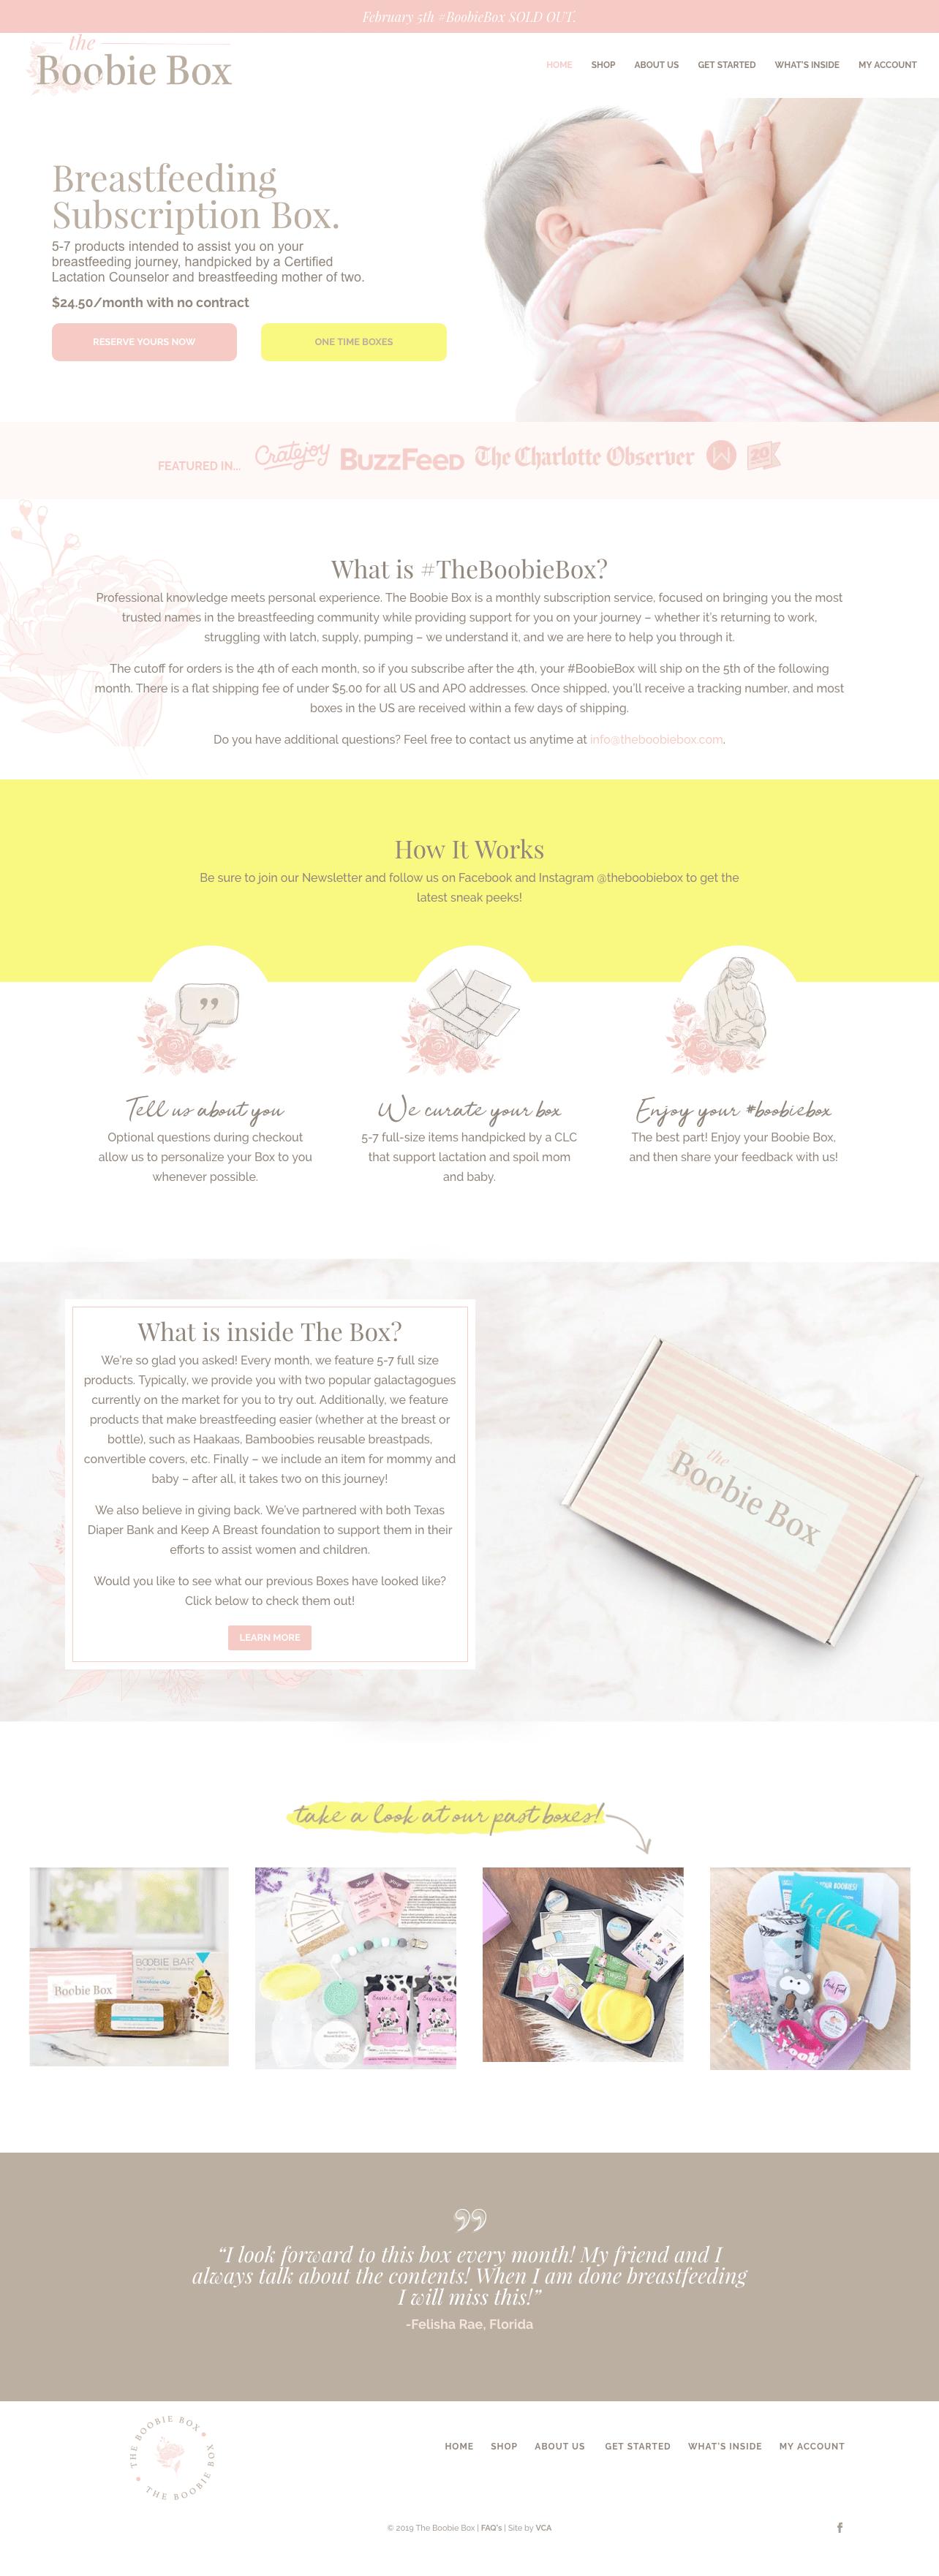 breastfeeding subscription box website